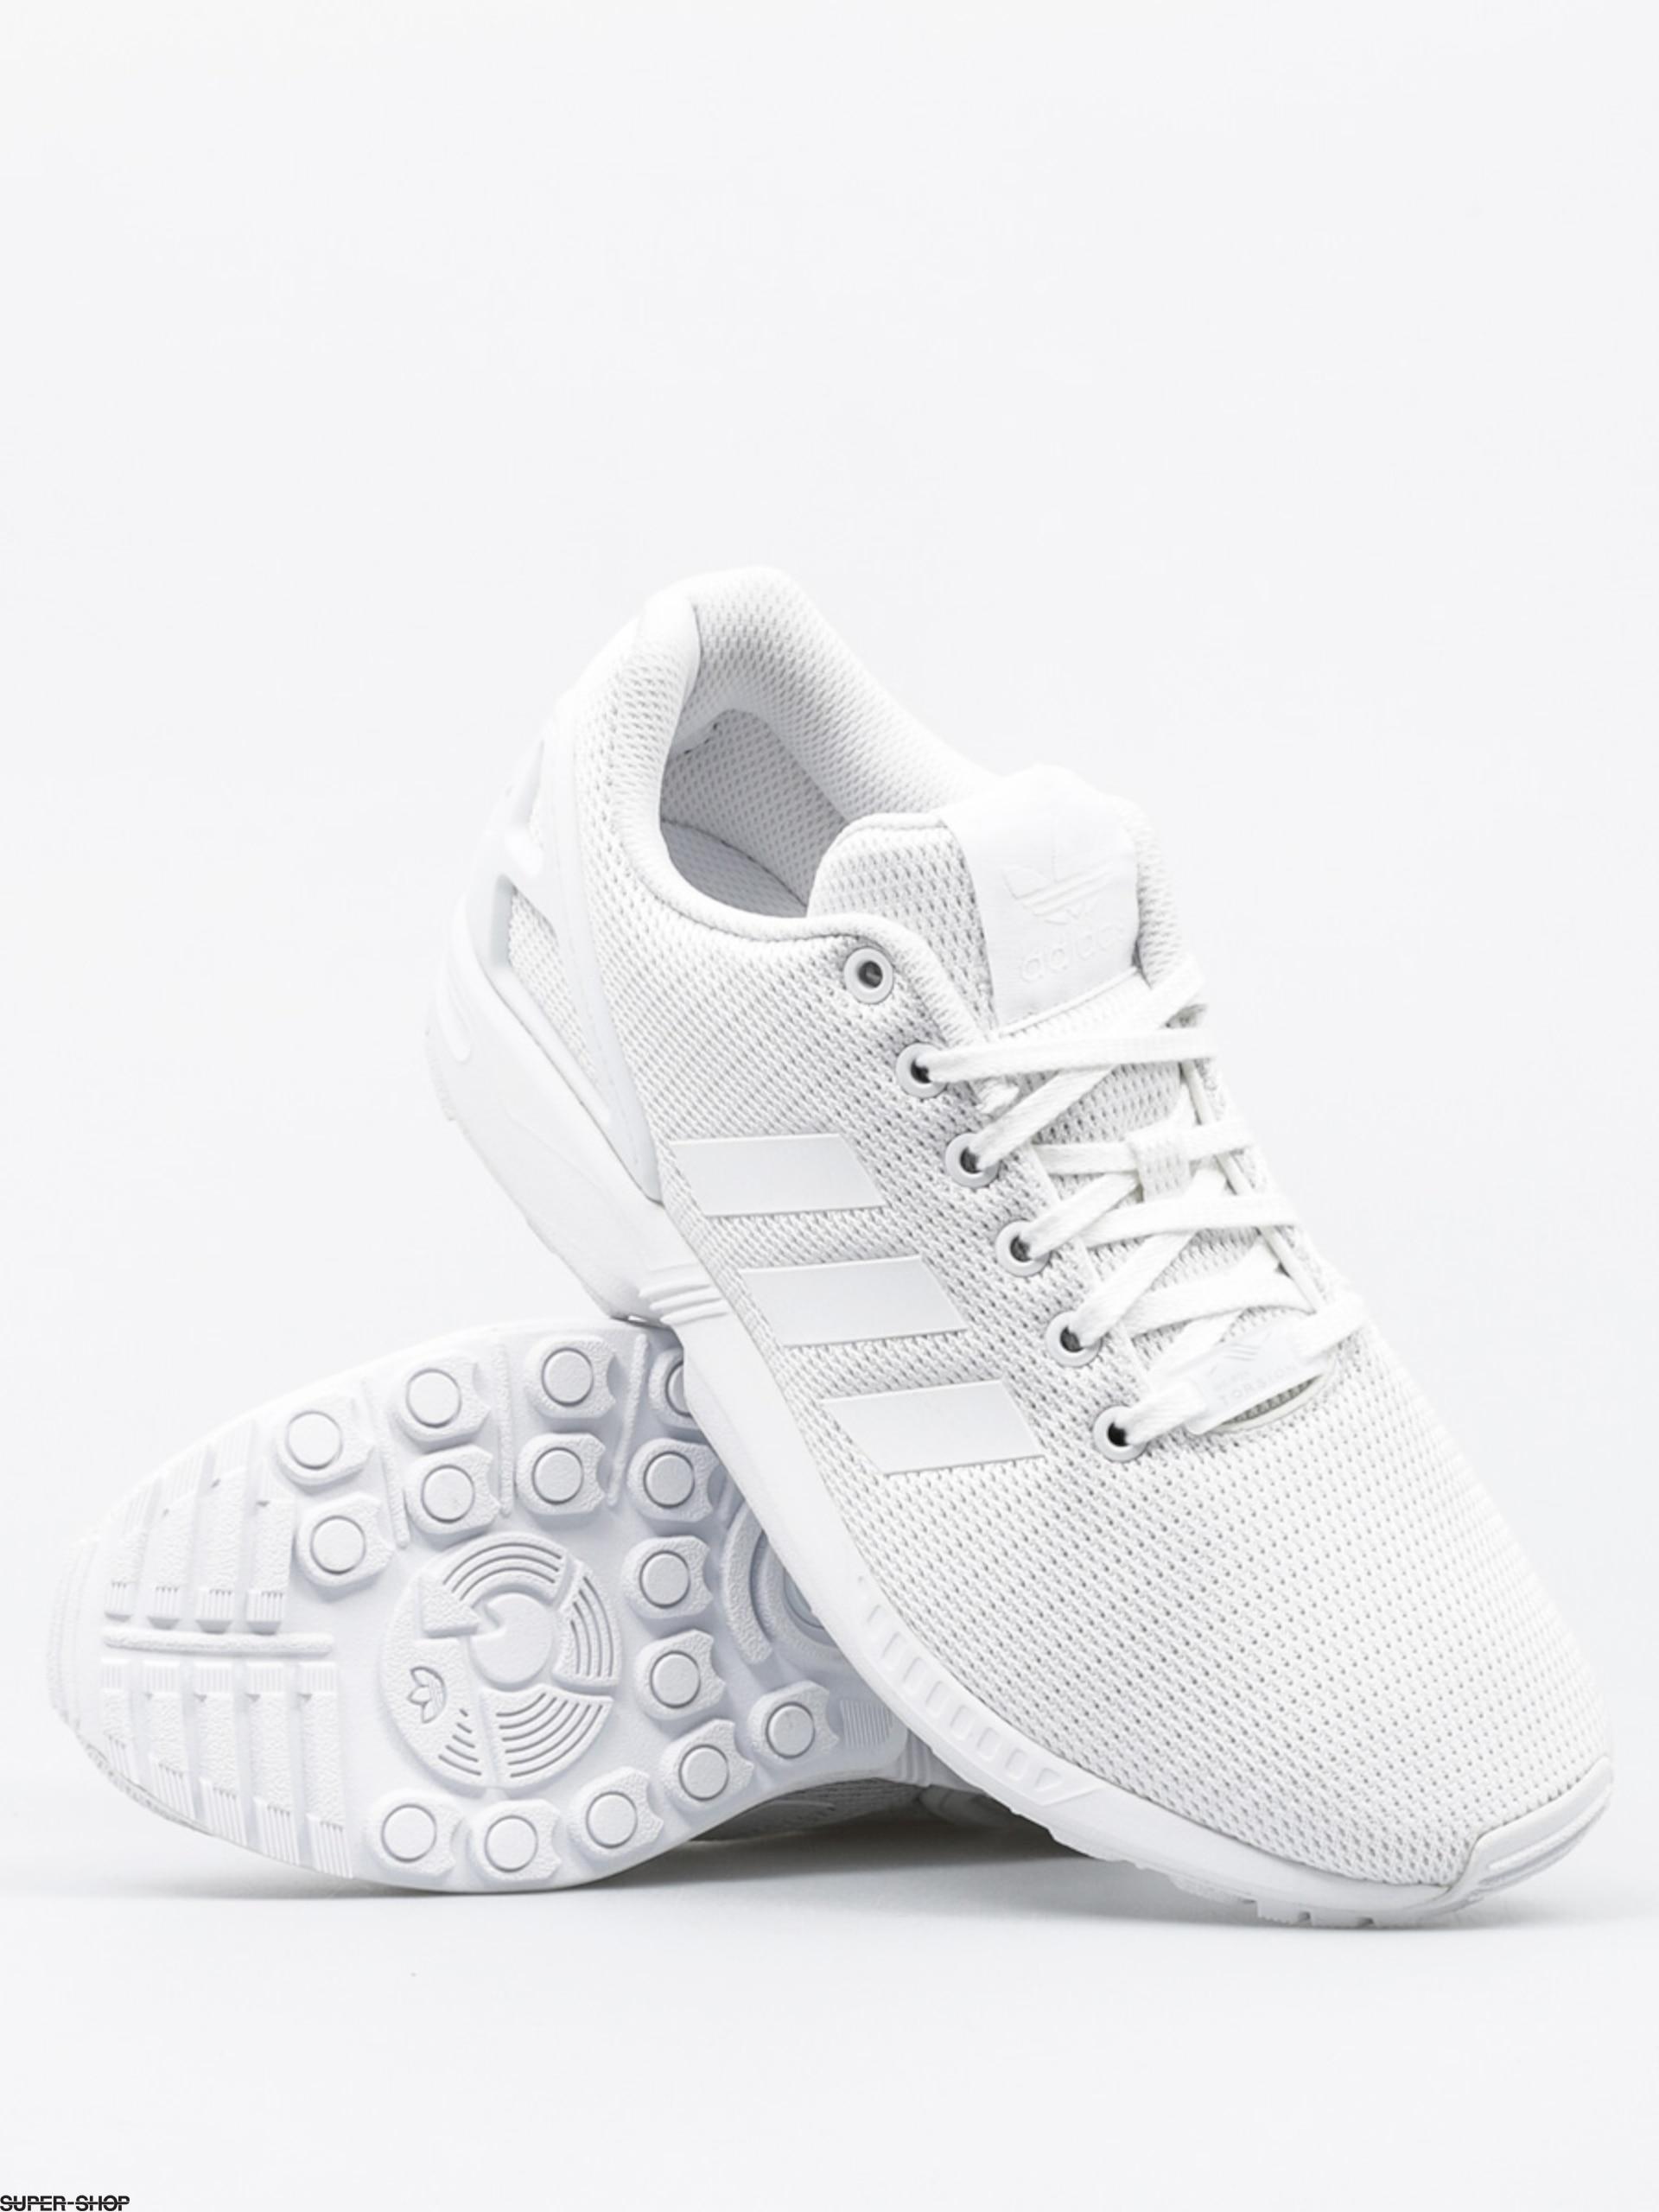 Fluxftwwhtftwwhtclgrey Adidas Schuhe Schuhe Zx Adidas Zx l13uFJTKc